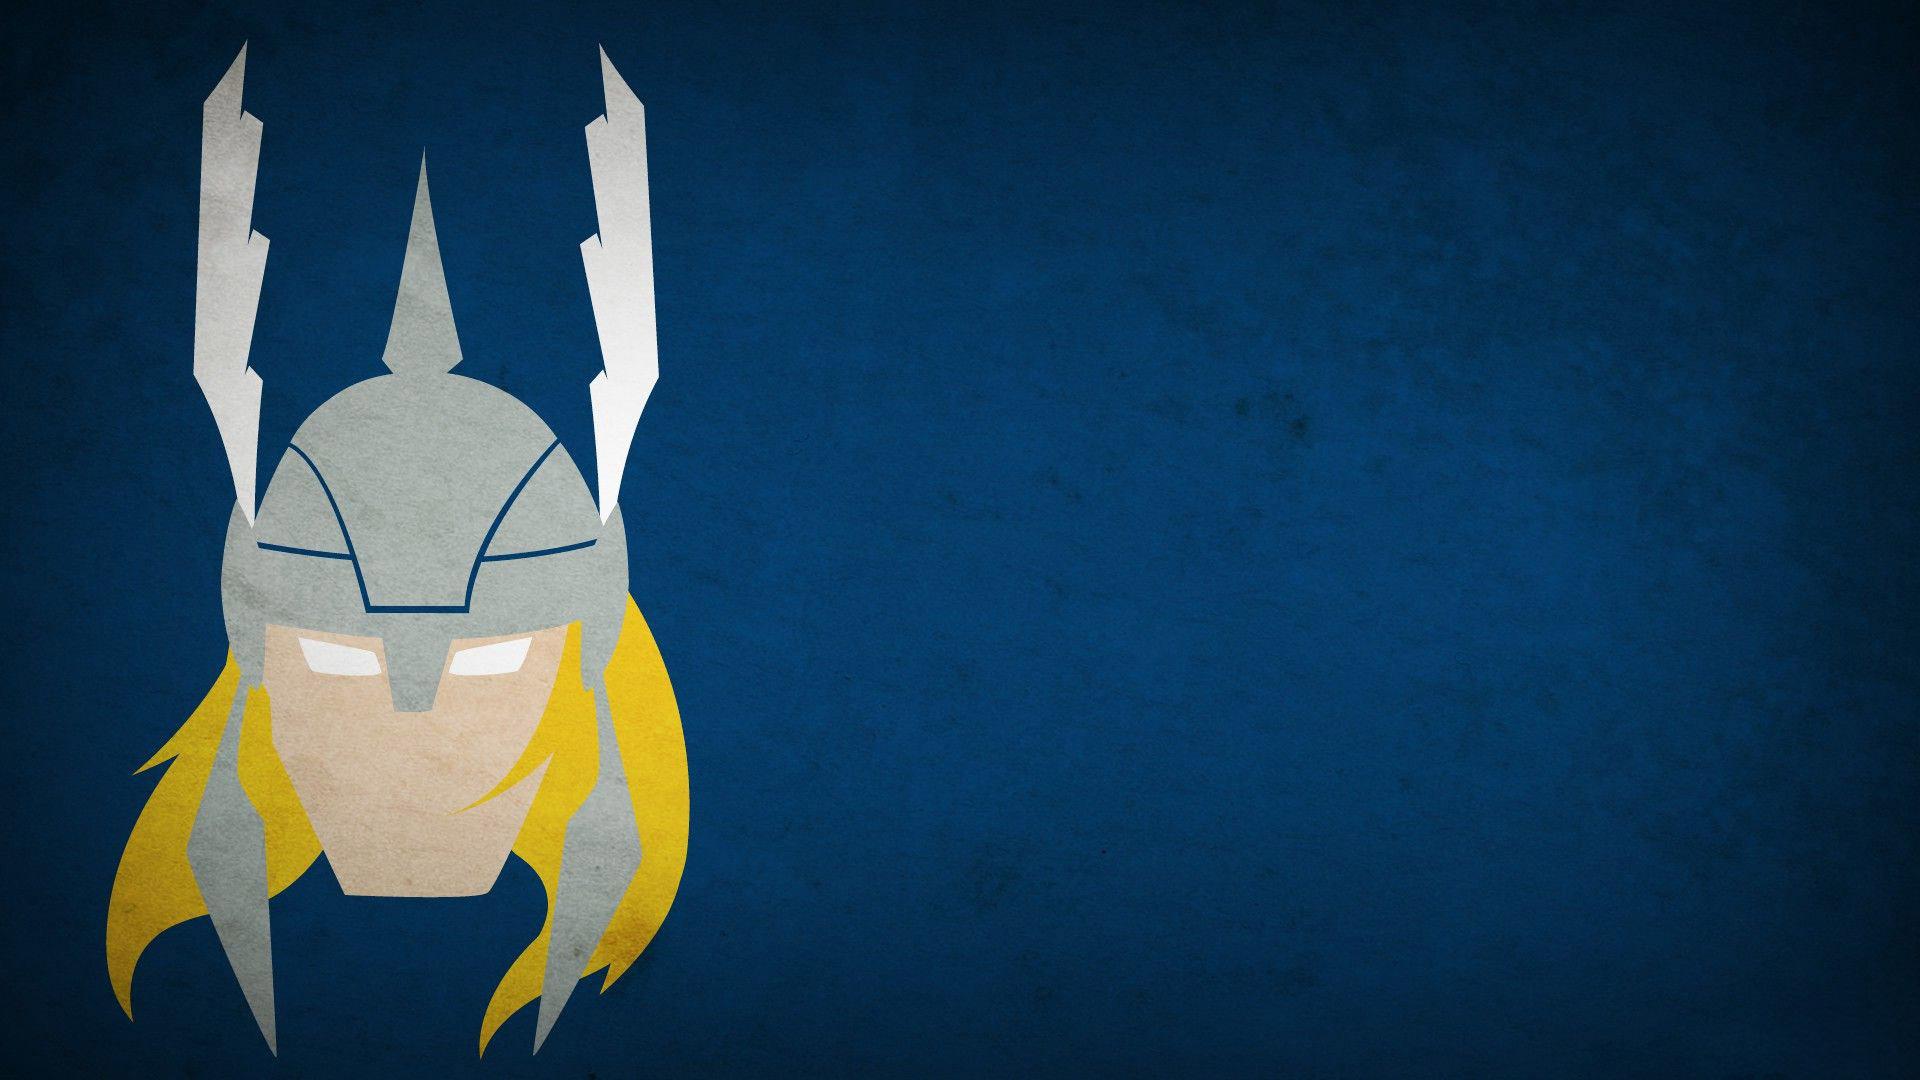 Free Thor Wallpaper HD for Desktop (6)